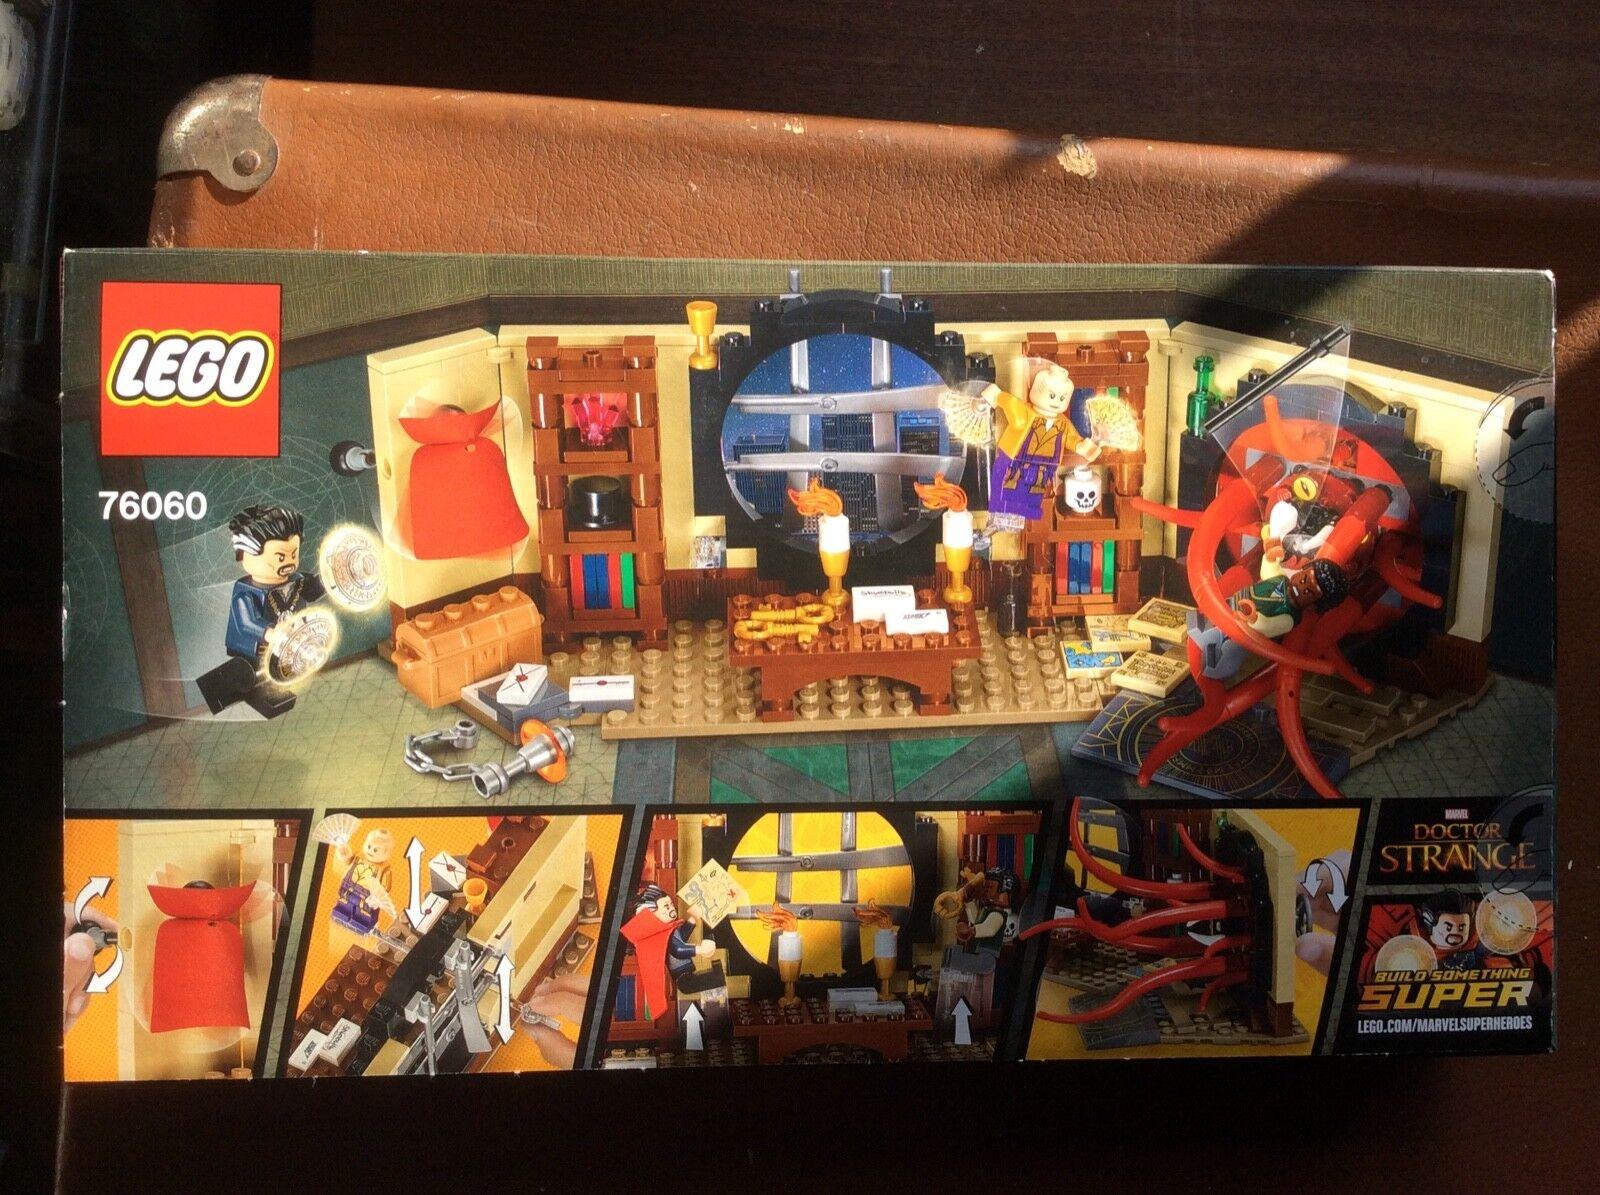 Lego Marvel Super Heroes Dr Strange's Sanctum Sanctorum.